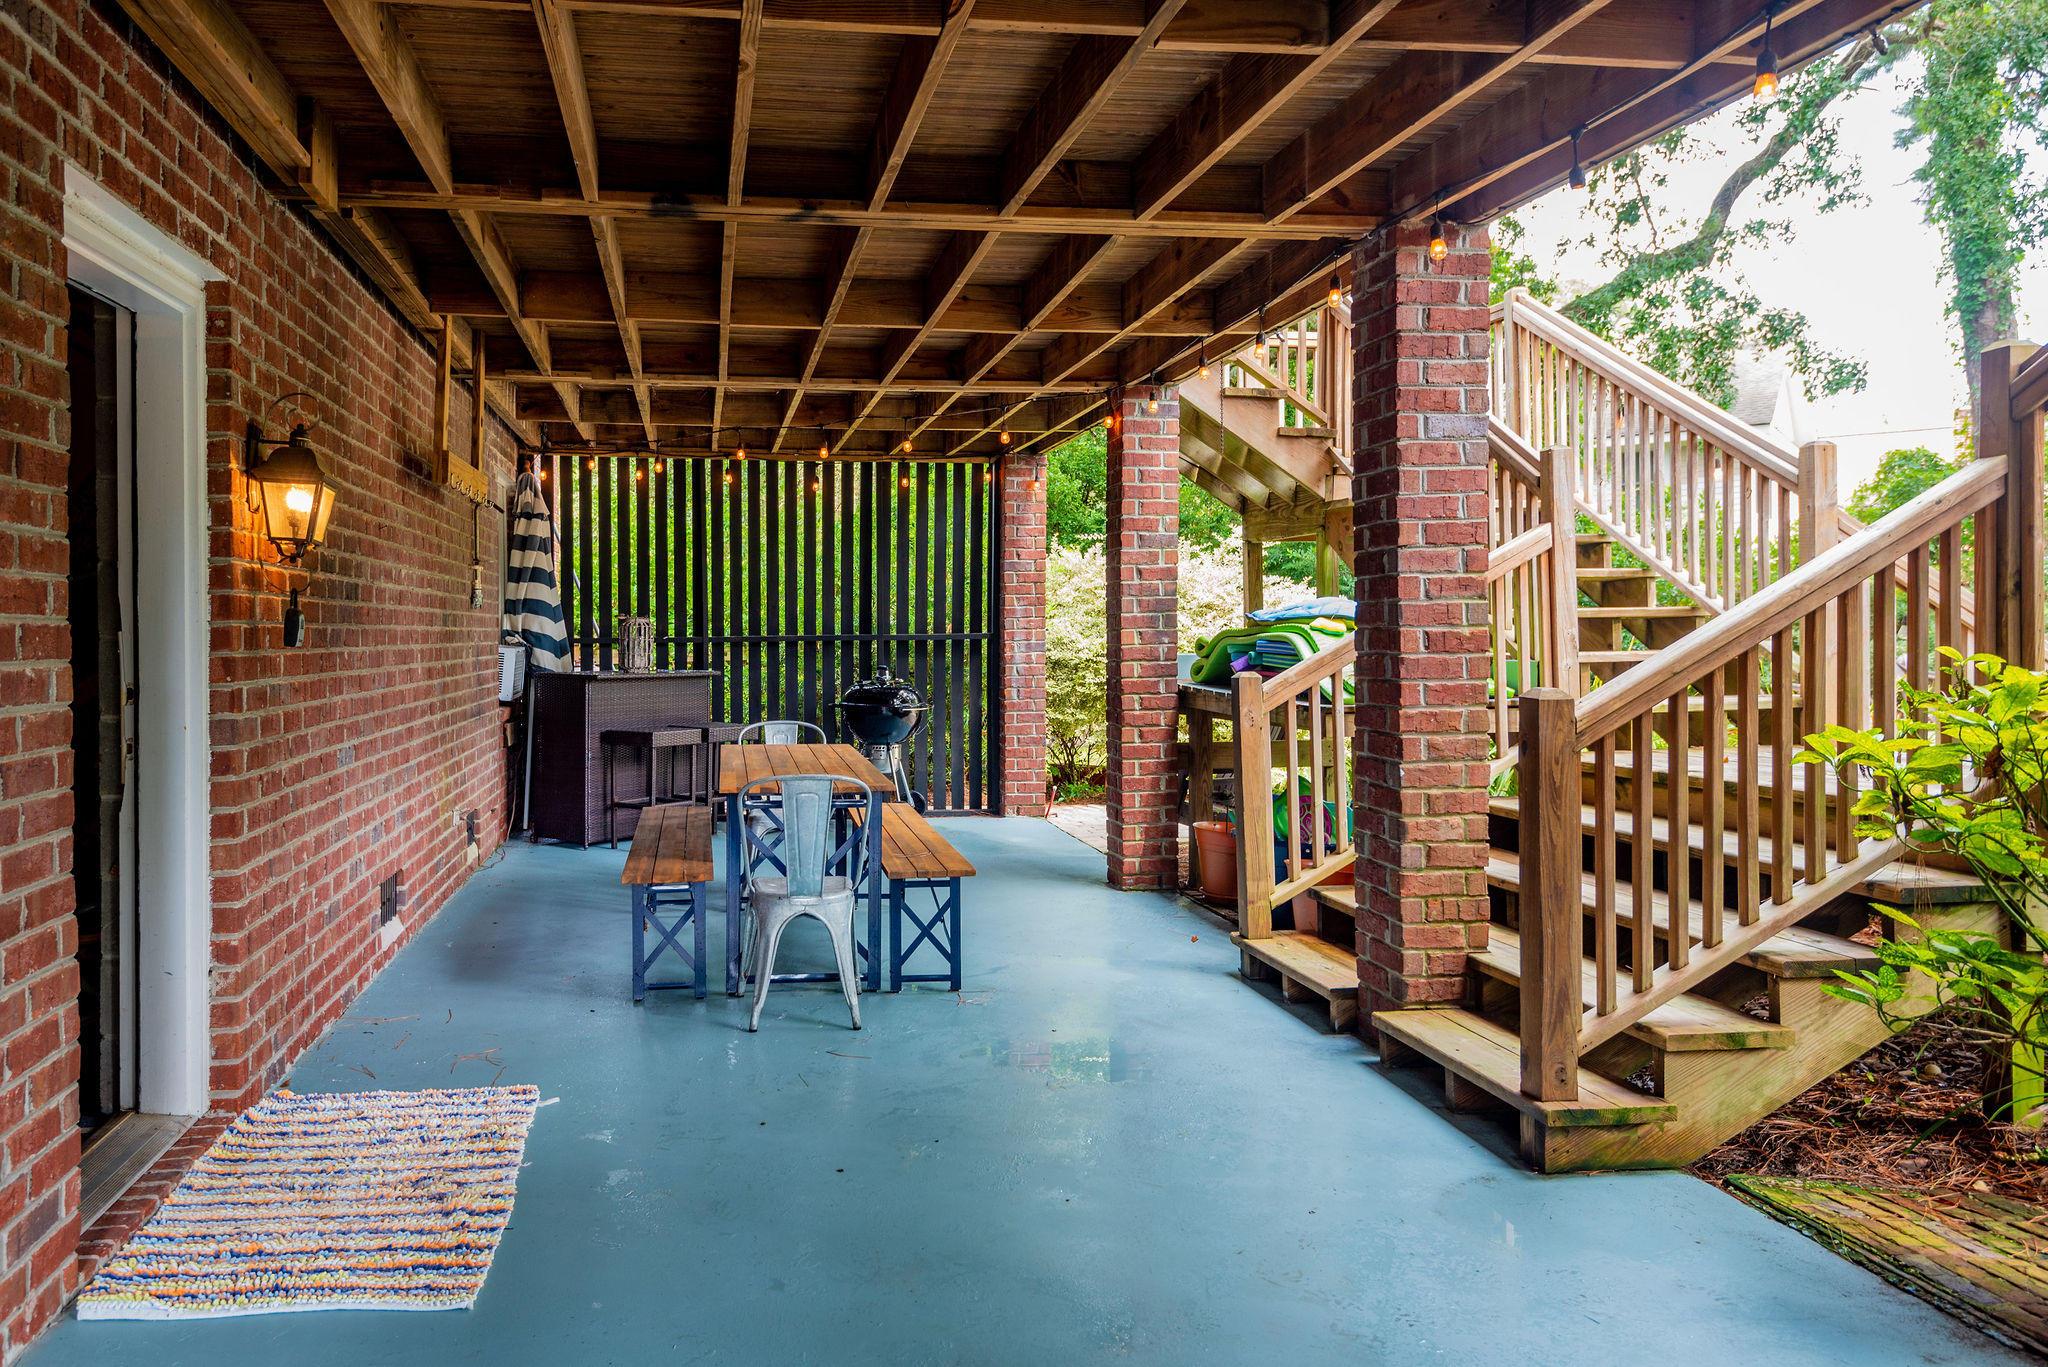 Country Club II Homes For Sale - 1482 Burningtree, Charleston, SC - 13